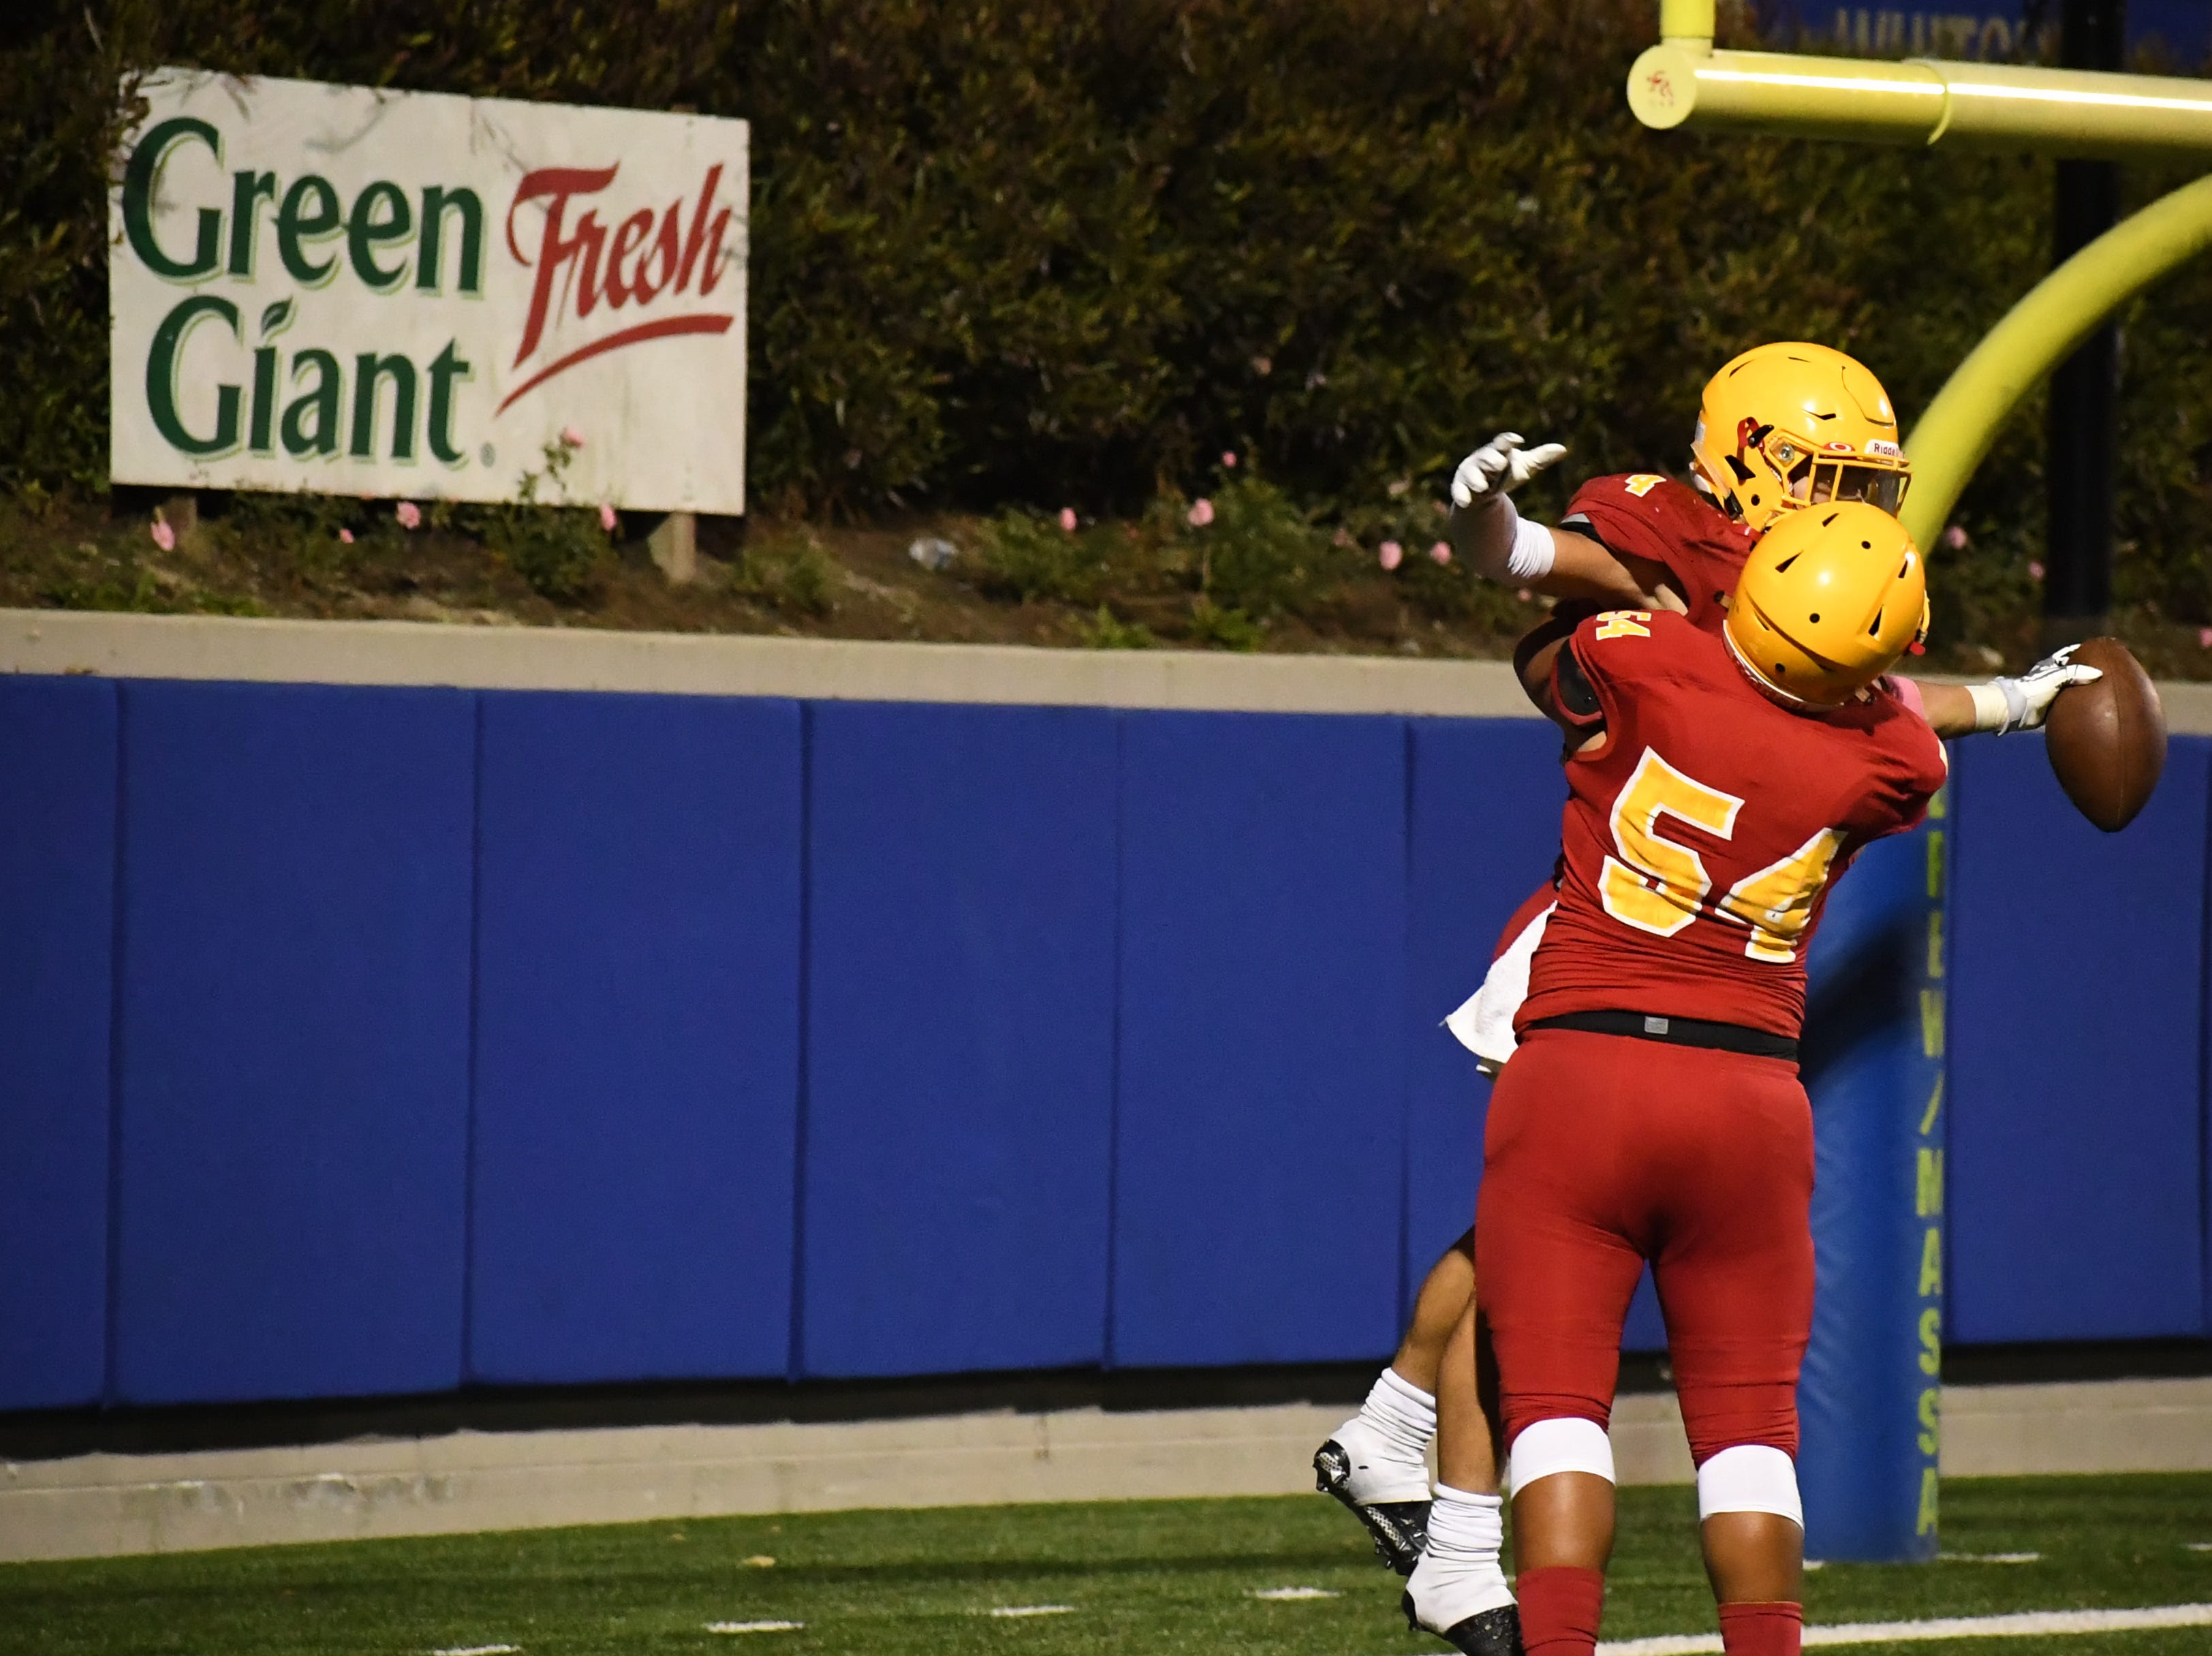 Palma junior running back Anthony Villegas (4) and lineman Oki Hautau (54) celebrate Villegas' 37-yard touchdown.